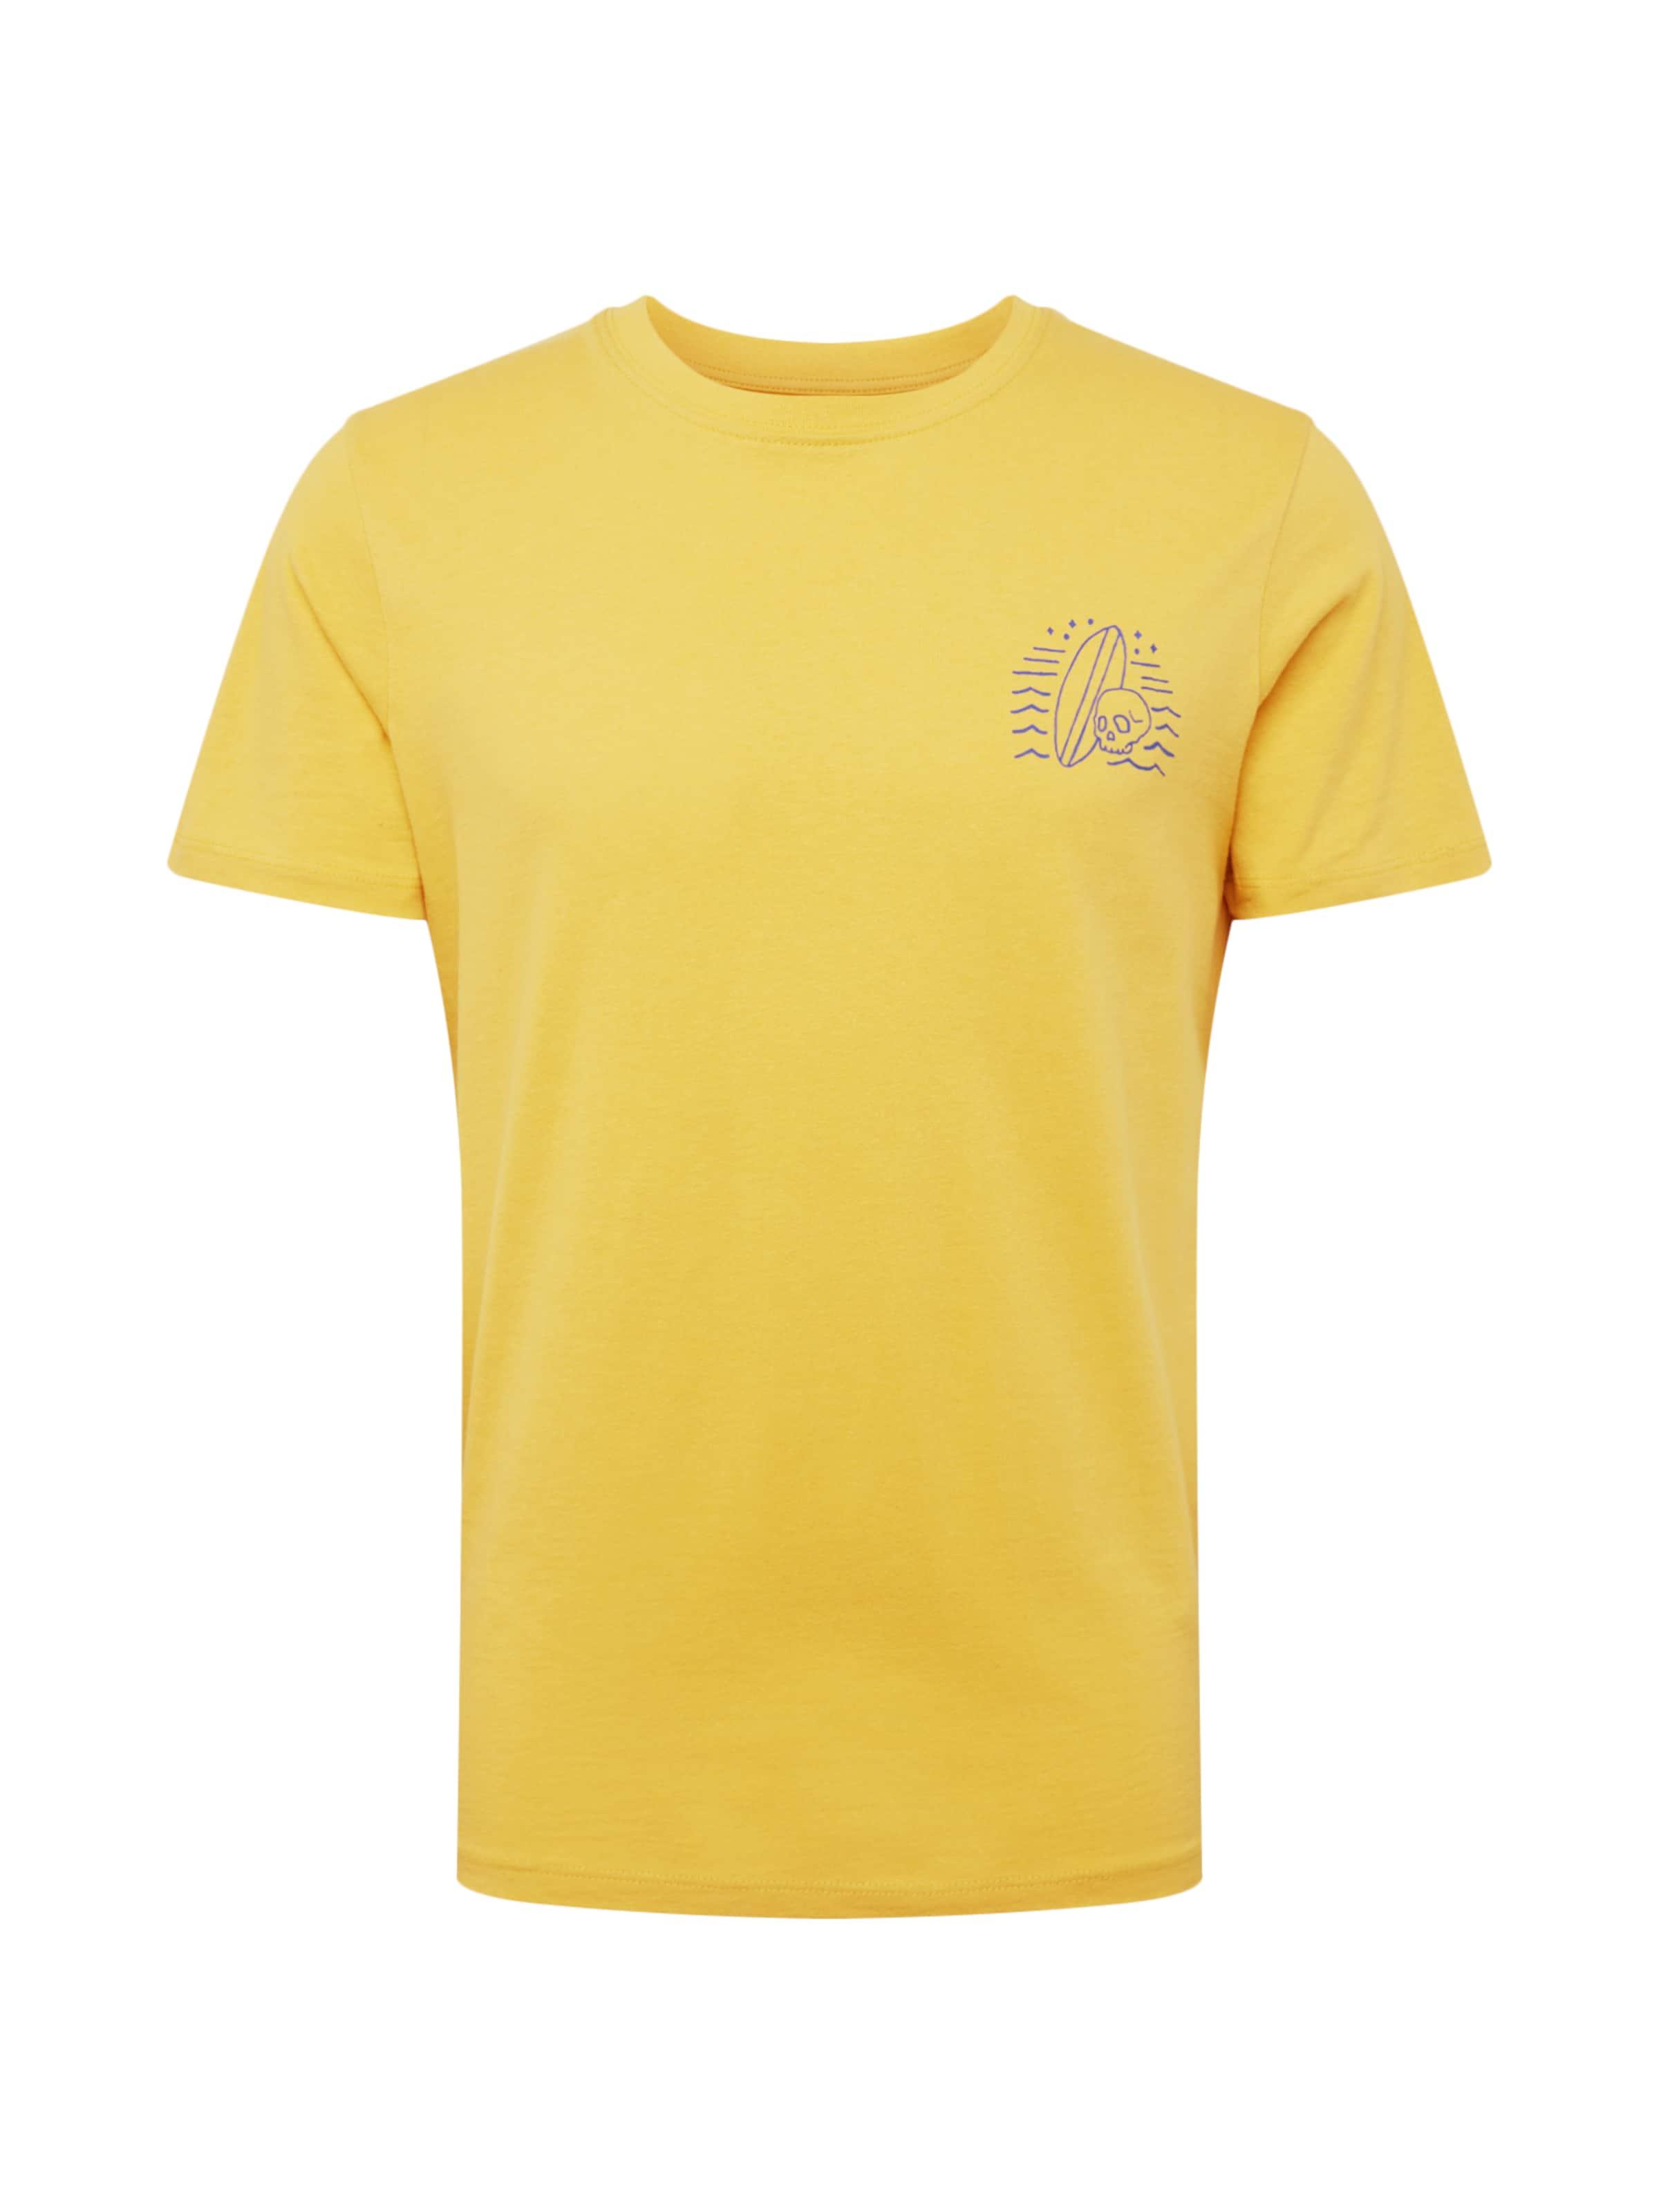 Jackamp; Ss En shirt Neck' Jaune Jones T Tee Crew 'jormalibuclub Yf76ybvg